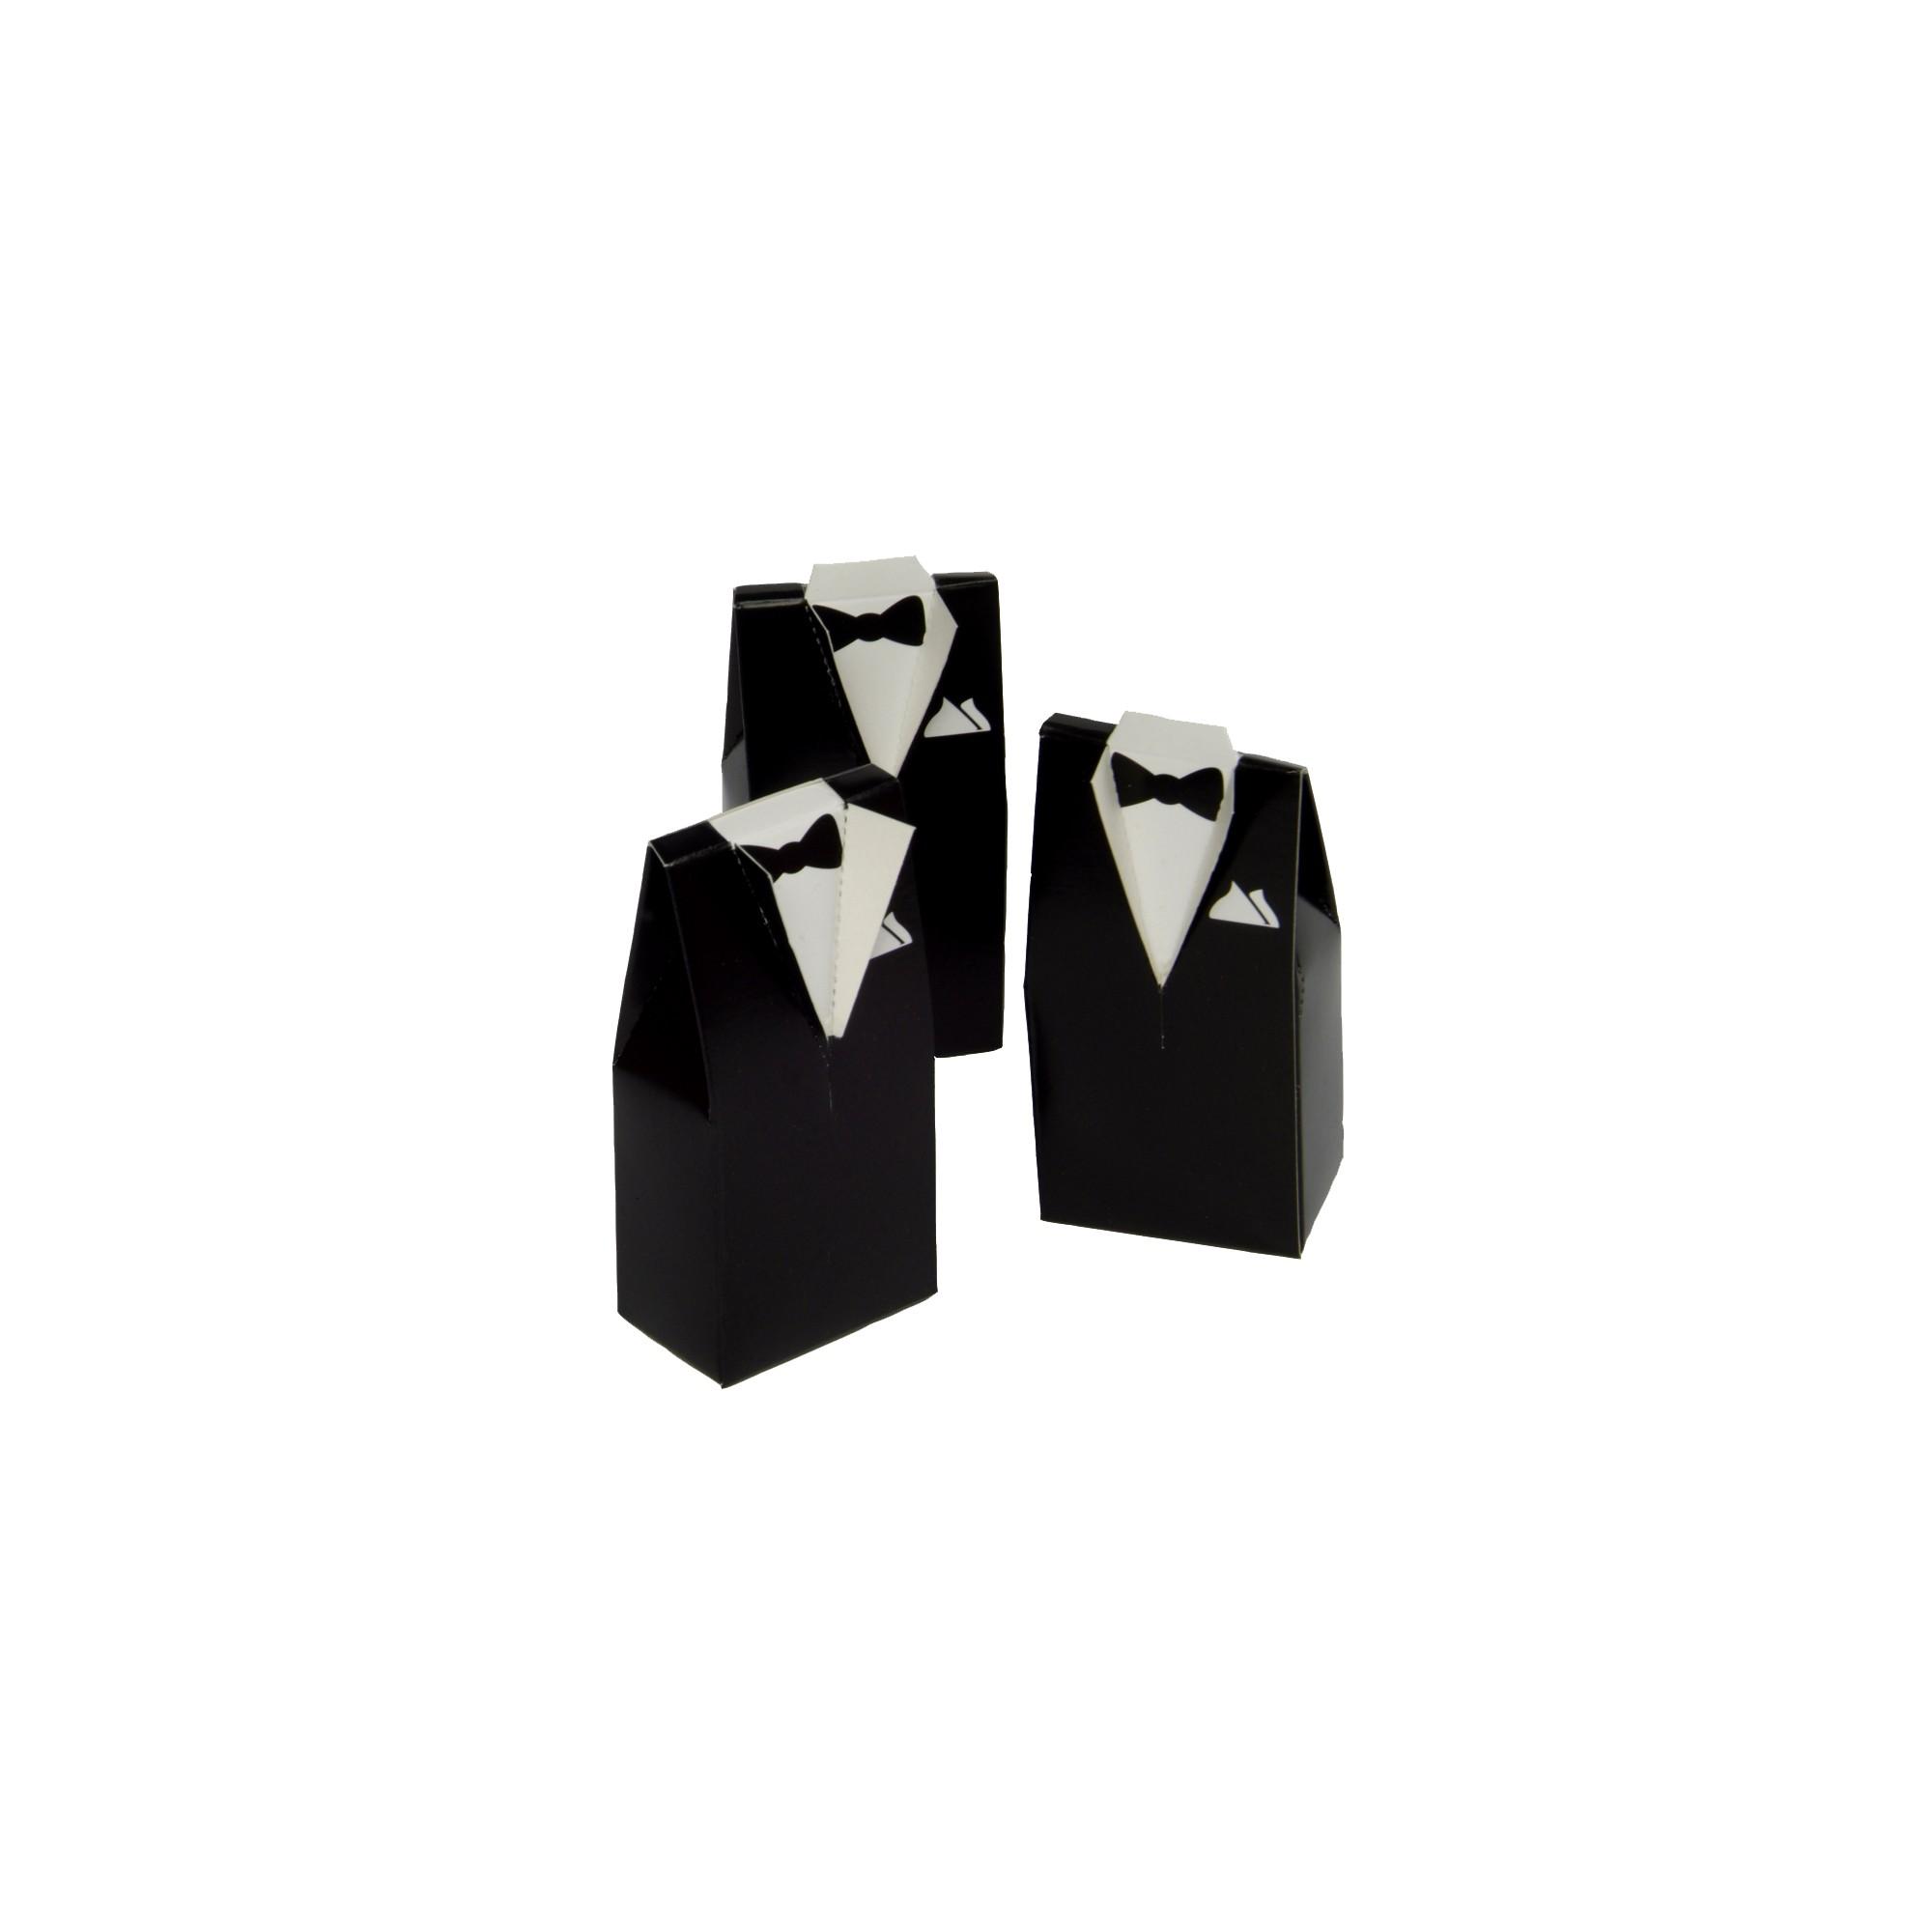 25ct Tuxedo Shaped Wedding Favor Boxes White